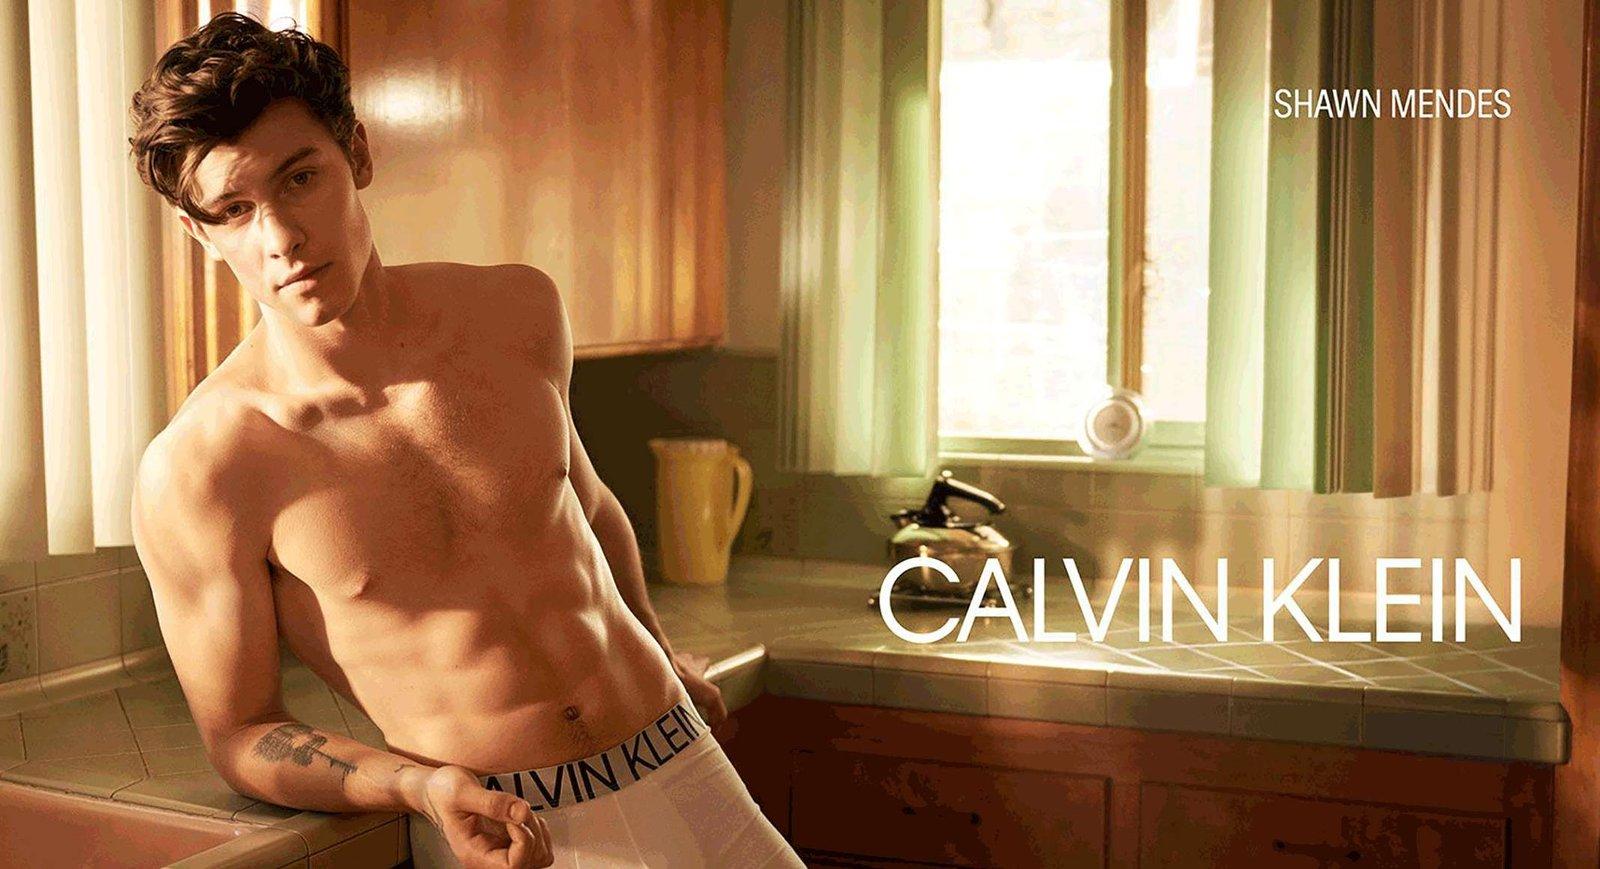 Shawn Mendez - Calvin Klein